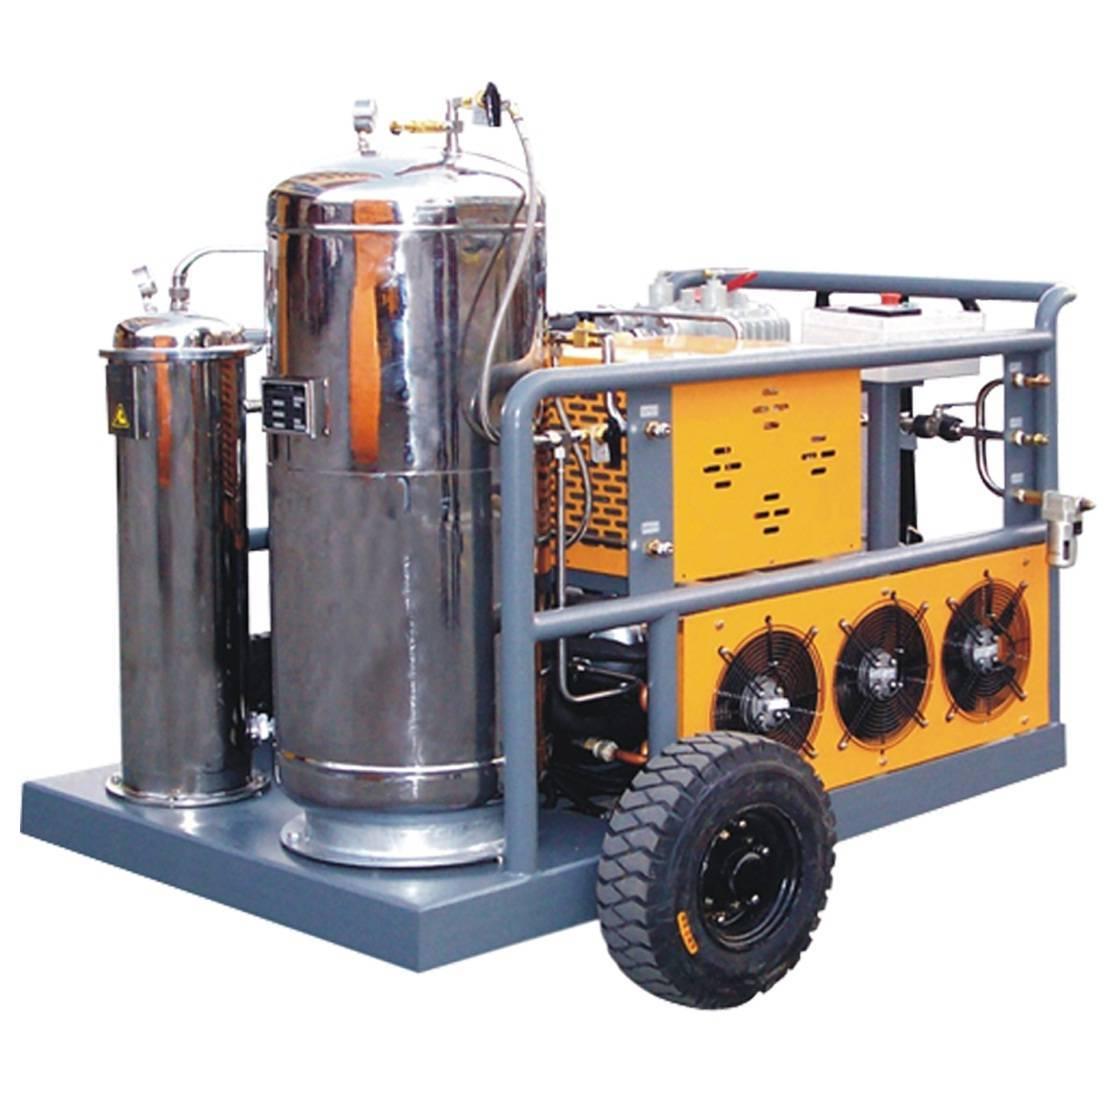 RF-120 Sulfur Hexafluoride(SF6) Recycling Device